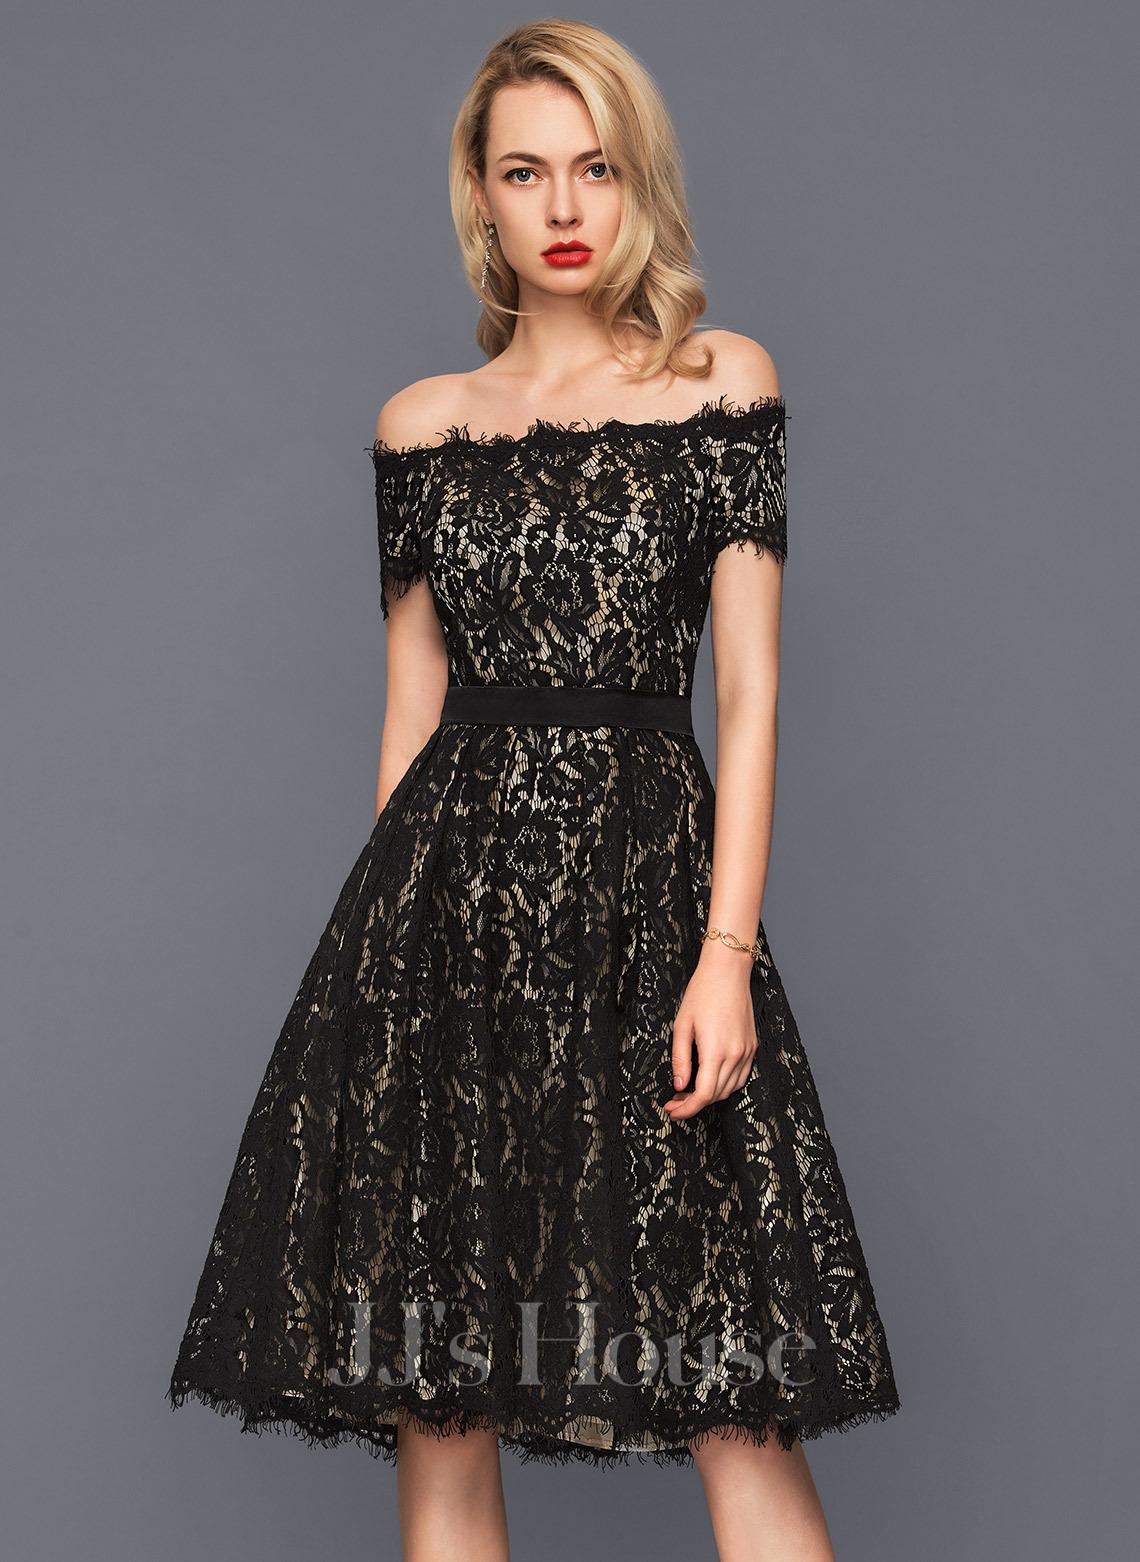 A-Line Off-the-Shoulder Knee-Length Lace Cocktail Dress